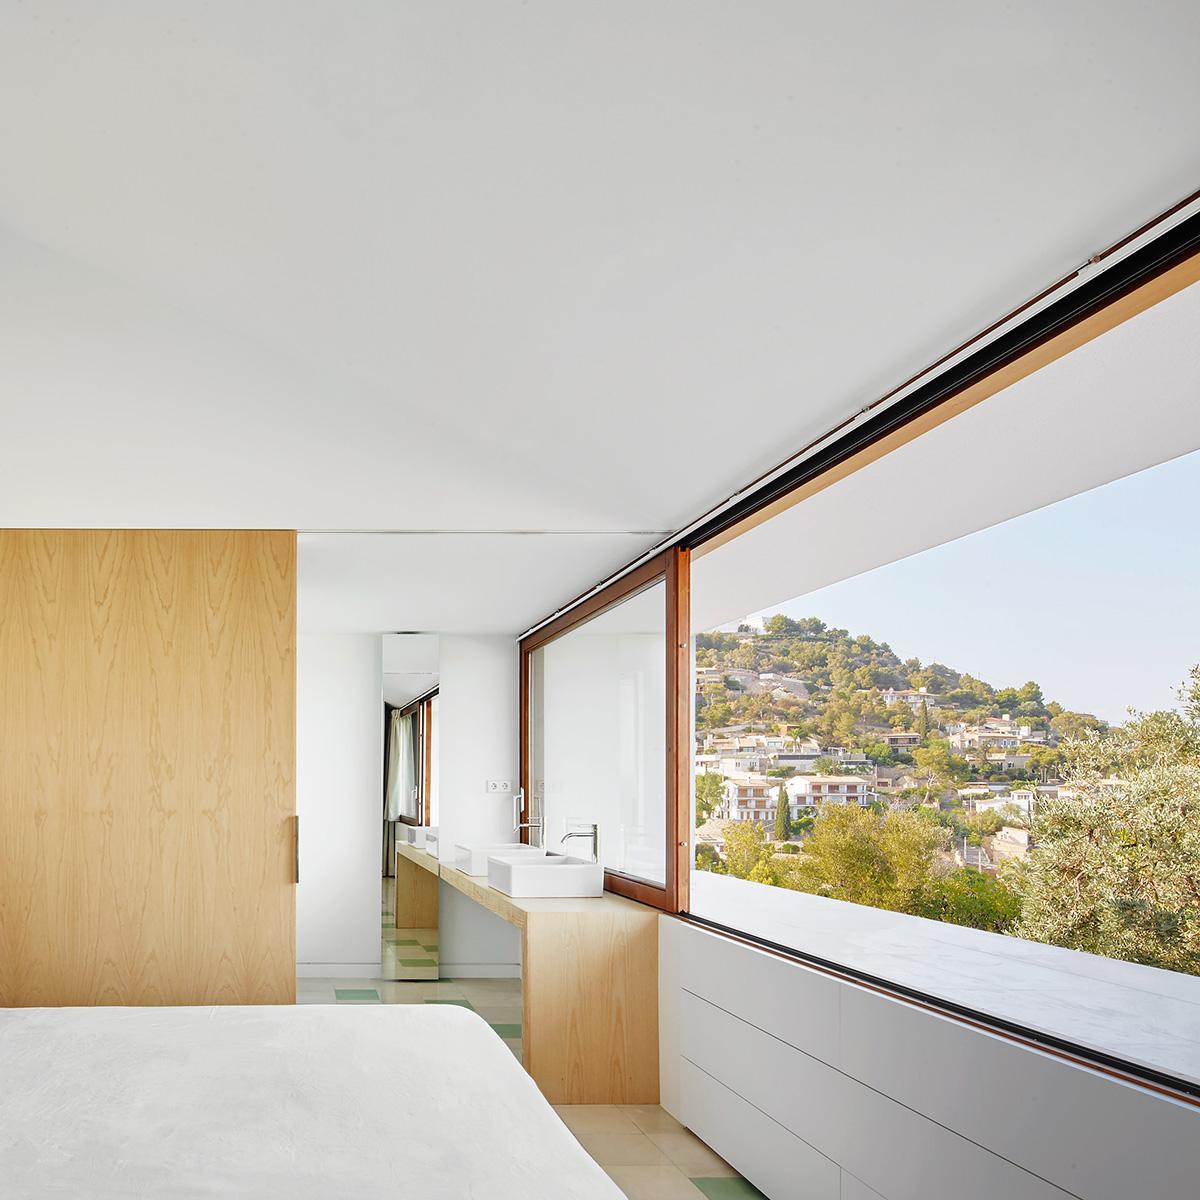 13-casa-mm-ohlab-oliver-hernaiz-architecture-lab-foto-jose-hevia